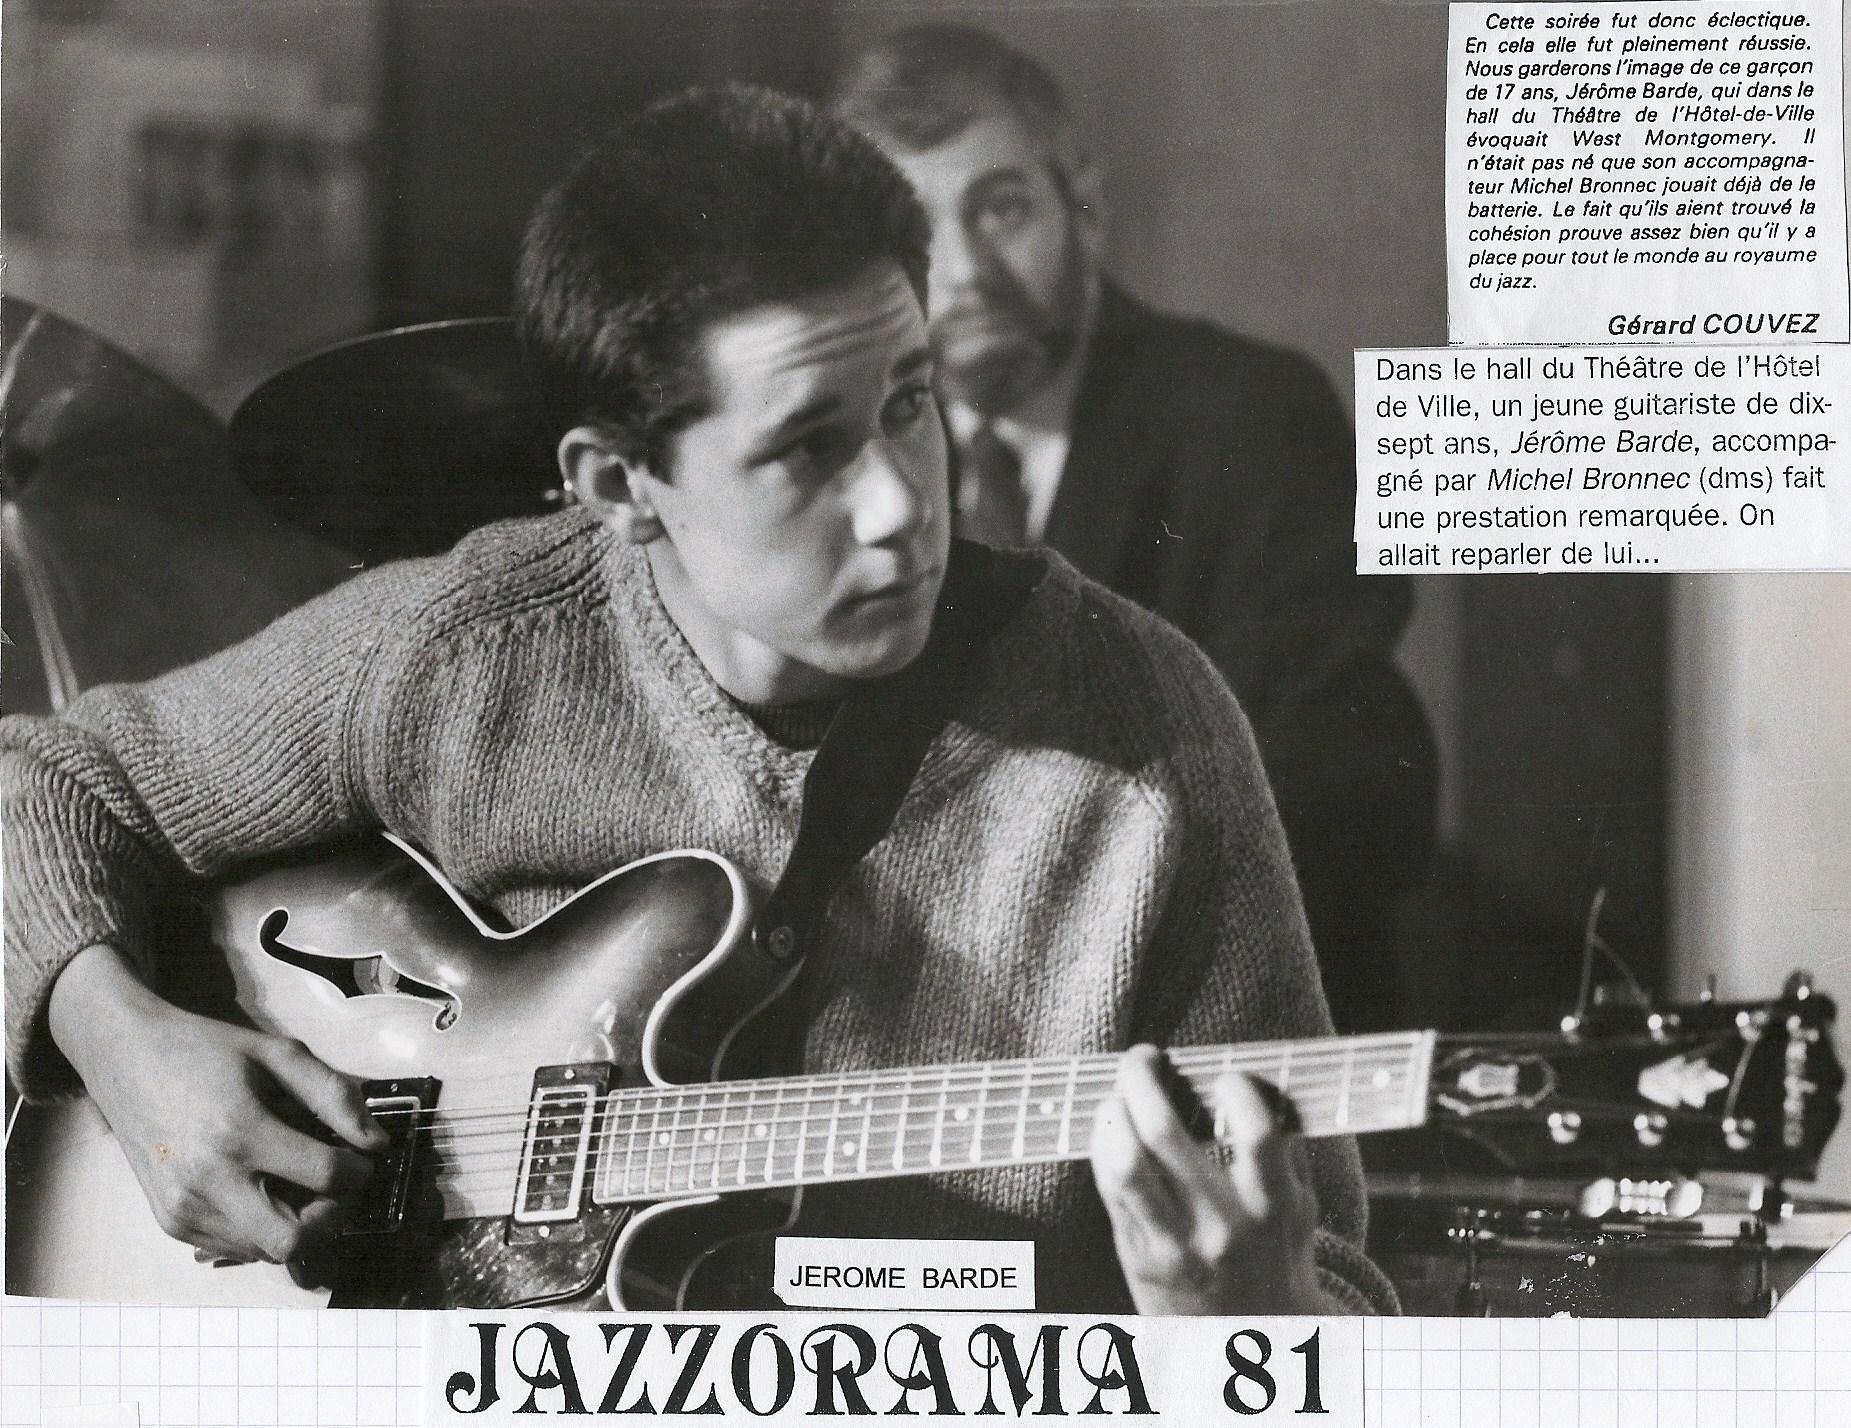 1981 JAZZORAMA avec JEROME BARDE - copie